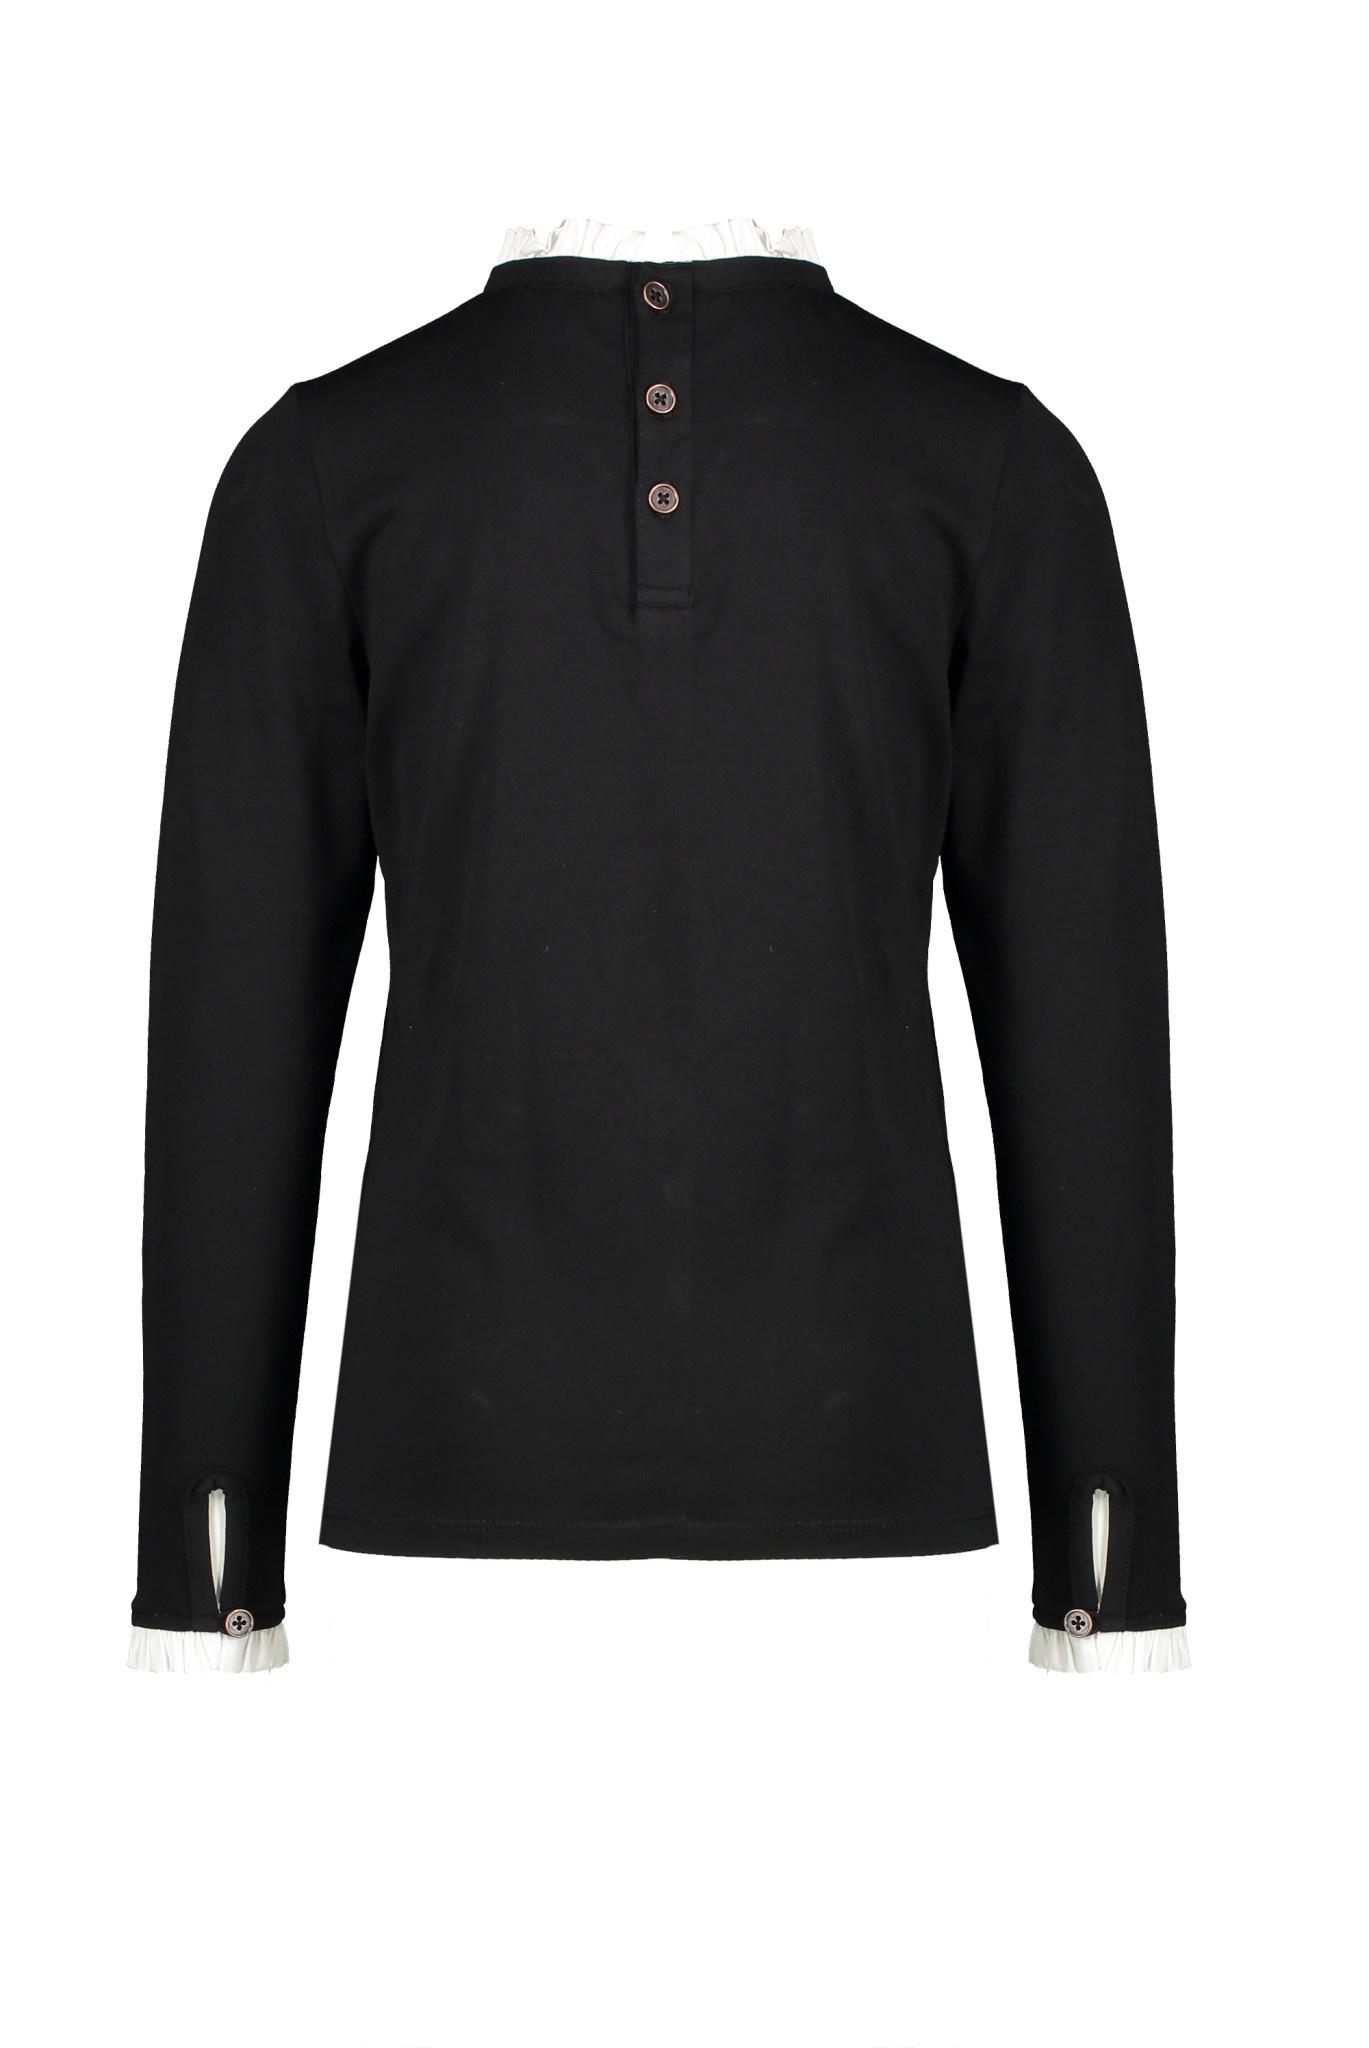 Kana Shirt with Ruffle Details